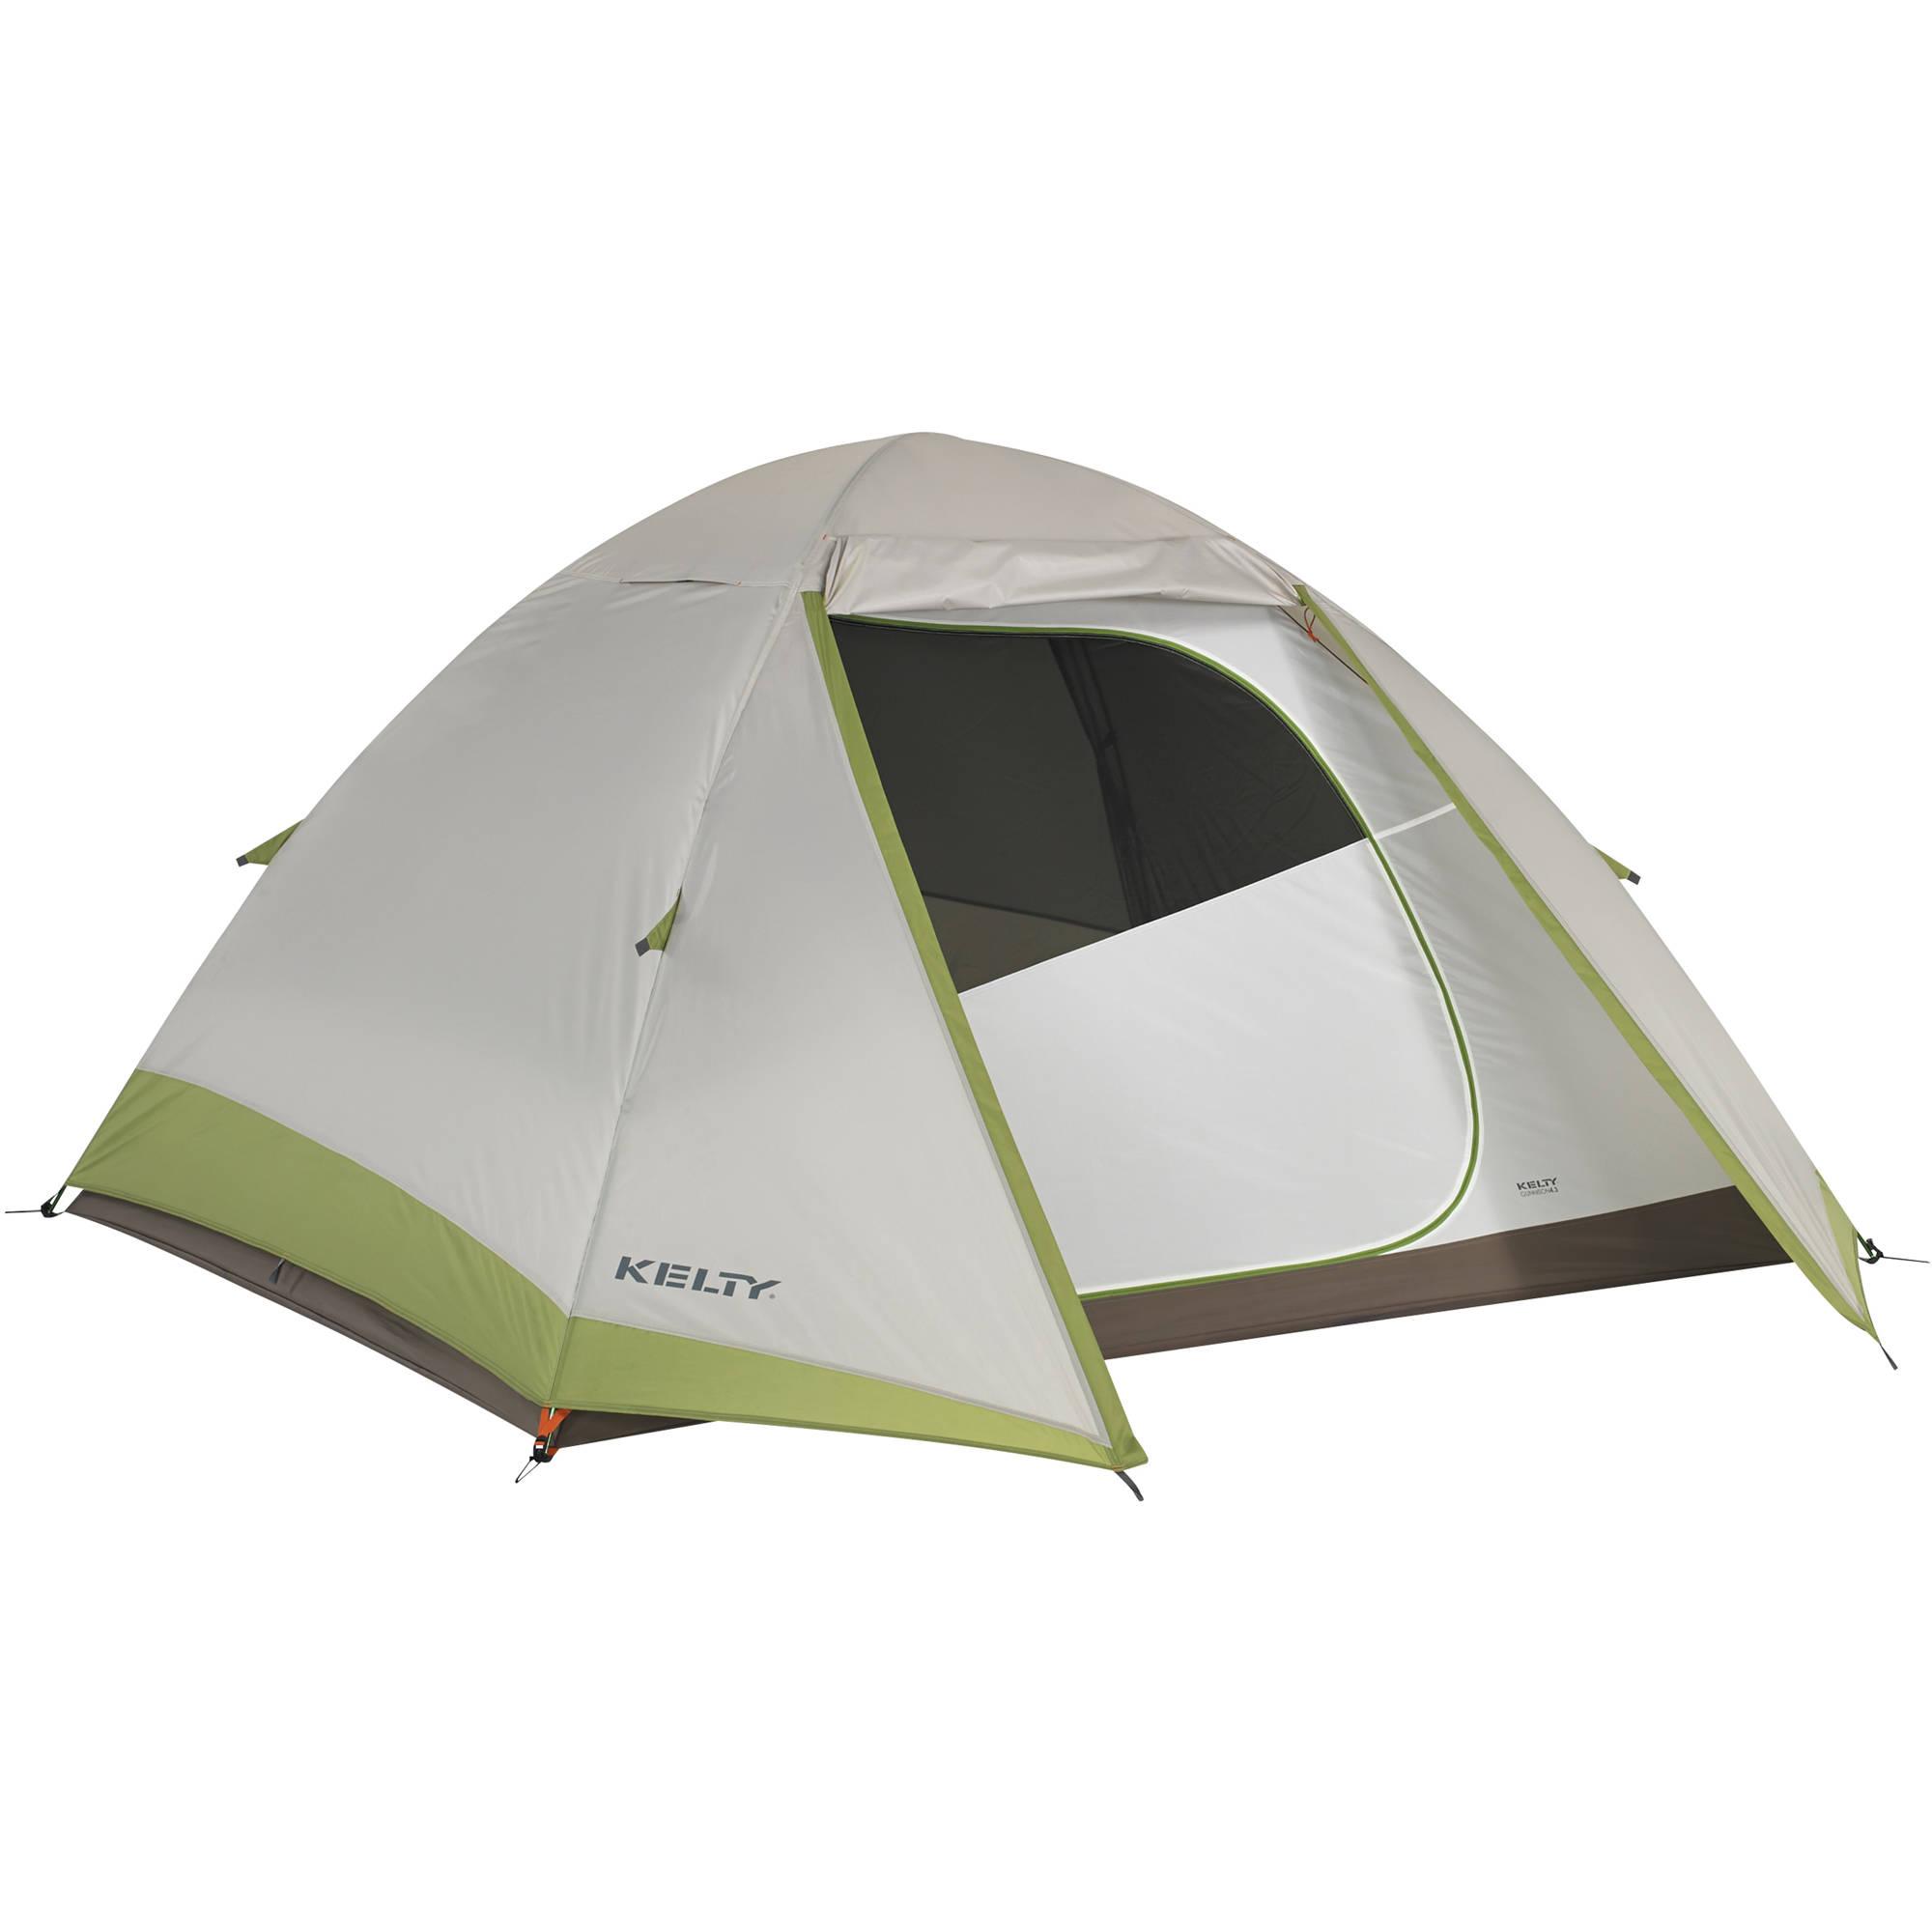 Kelty Gunnison 4.3 4-Person Tent 40816415 B&H Photo Video